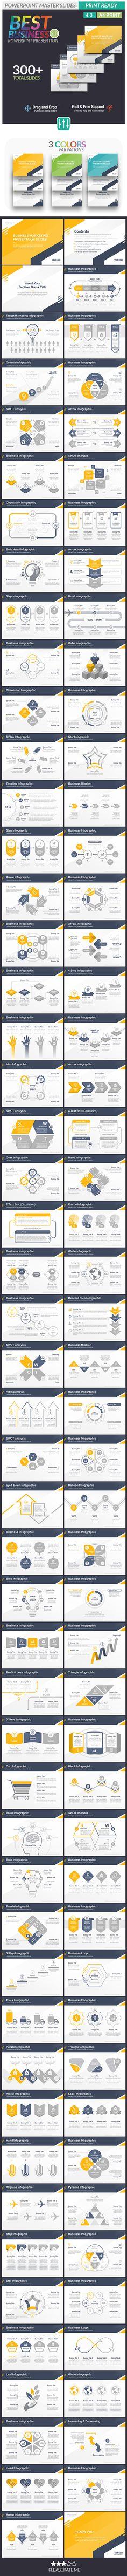 Best Business 003 -  PowerPoint Template